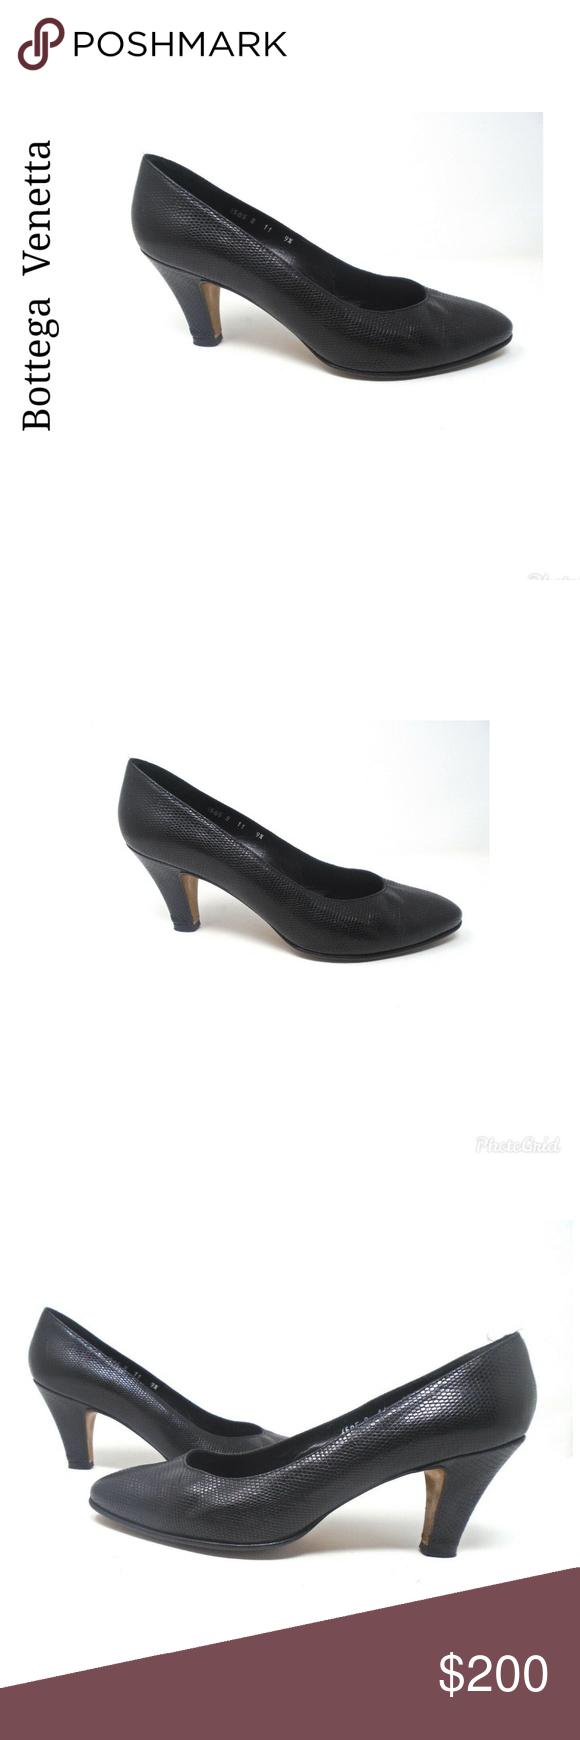 Bottega Veneta Womens Square Toe Strappy High Heel